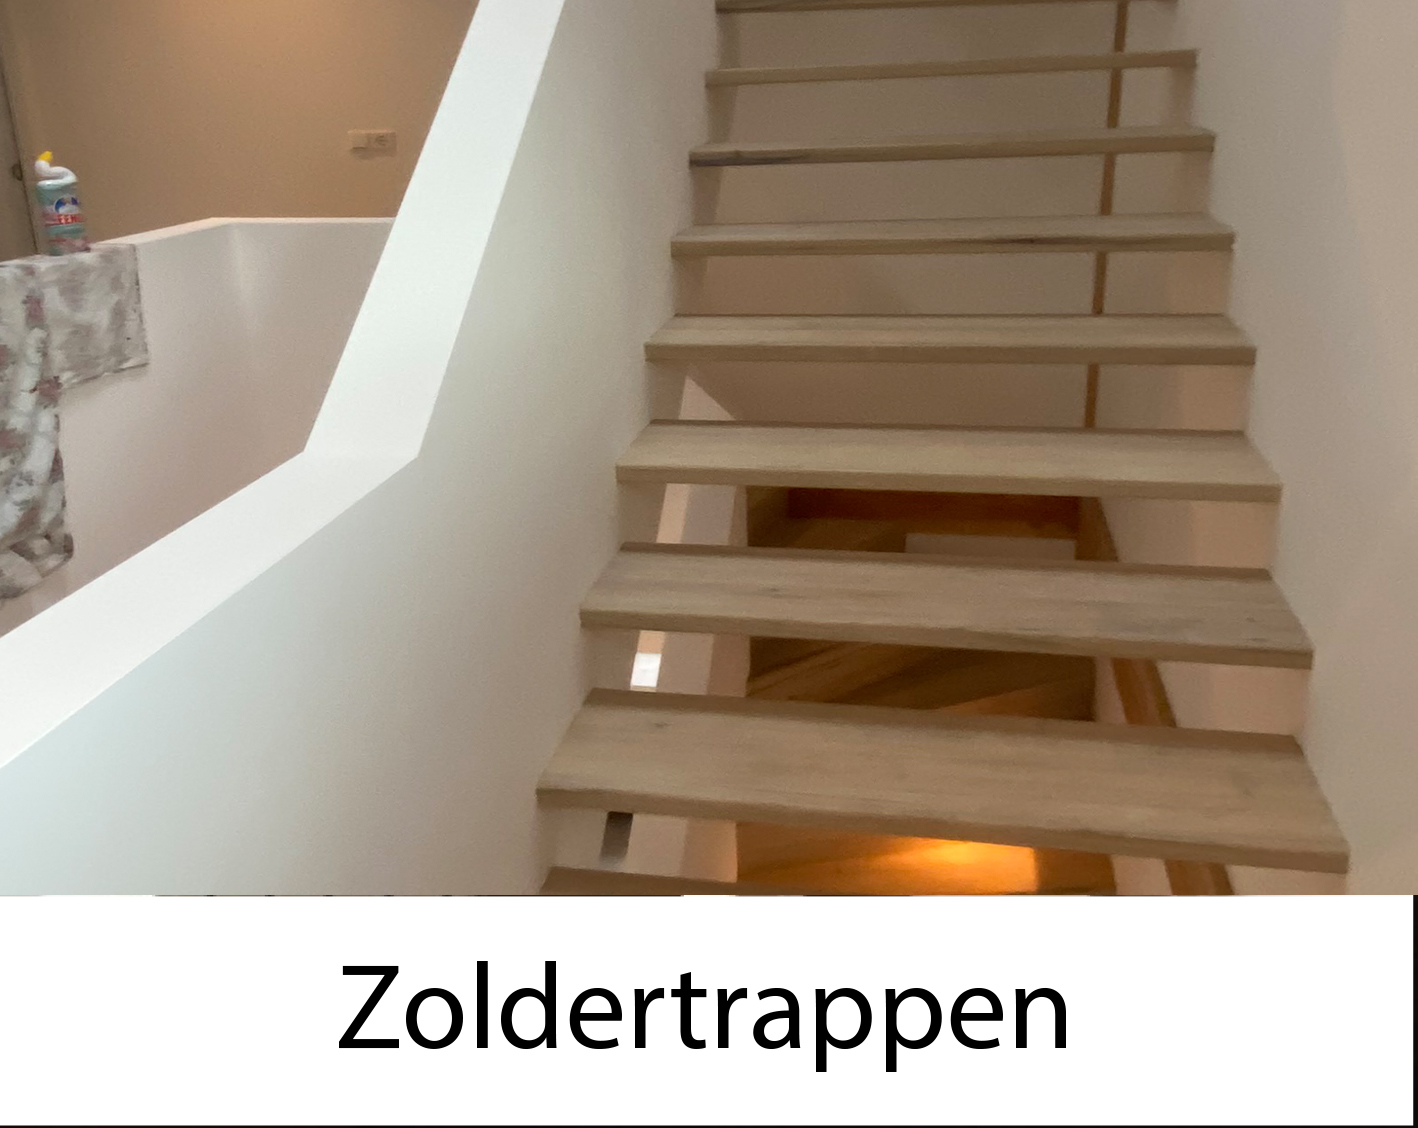 Zolder trappen